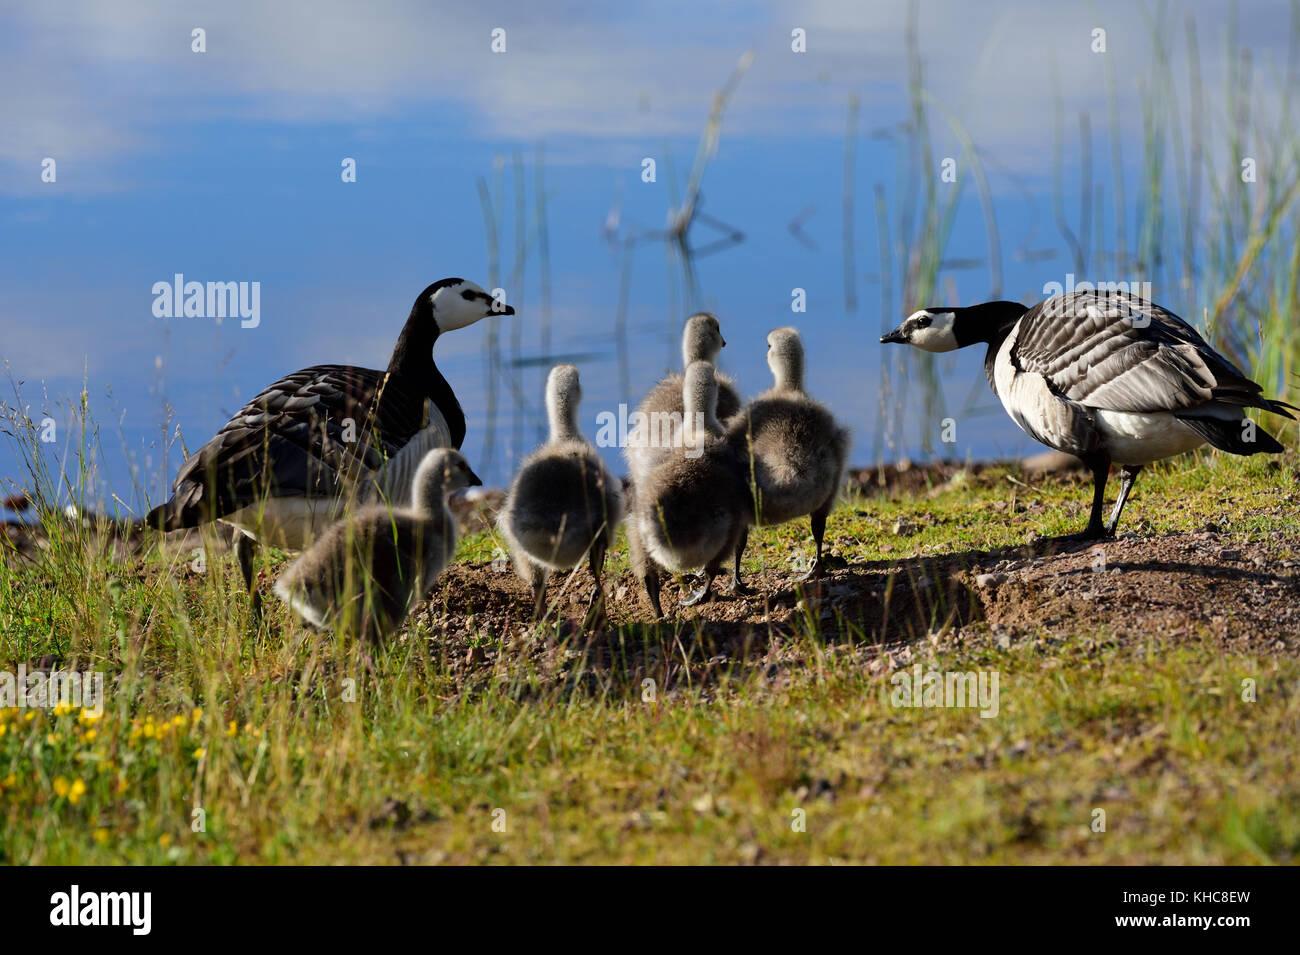 Barnacle goose, Branta leucopsis, Anatidae, adult, gosling, goose, bird, animal, Kättbo, Mora kommun, Dalarna - Stock Image